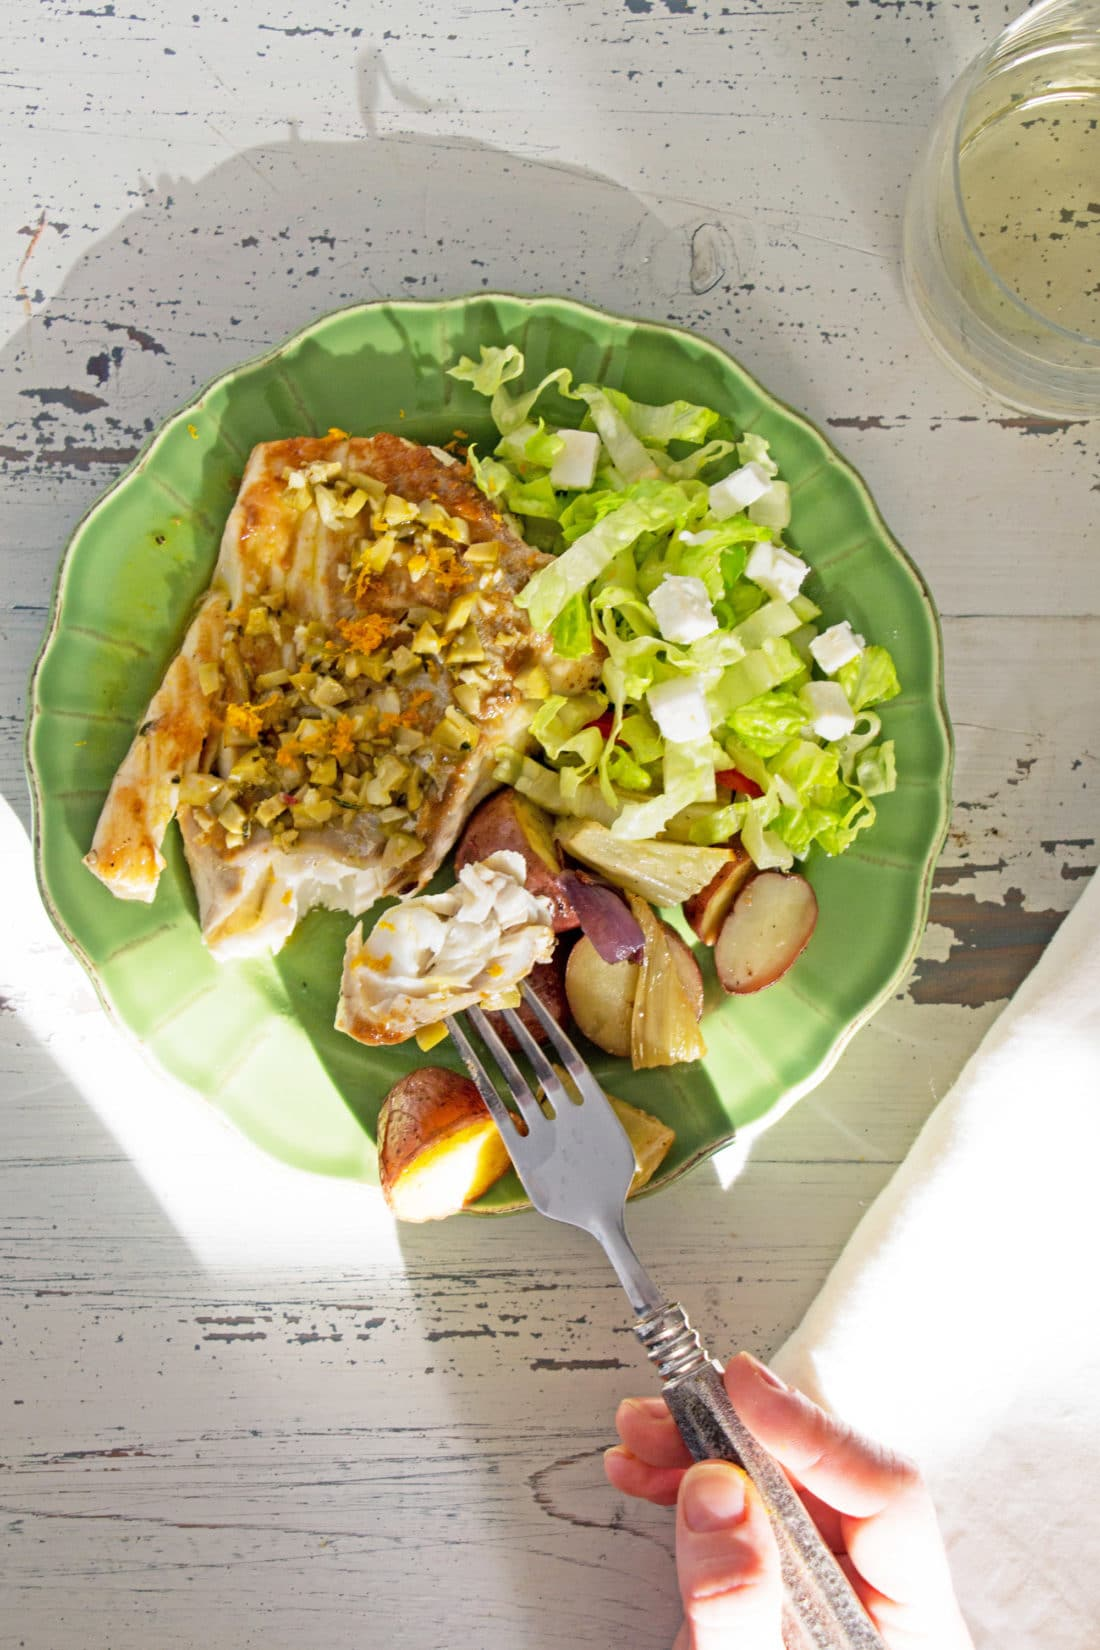 Rosemary Orange Cod Fillets / Photo by Mandy Maxwell / Katie Workman / themom100.com